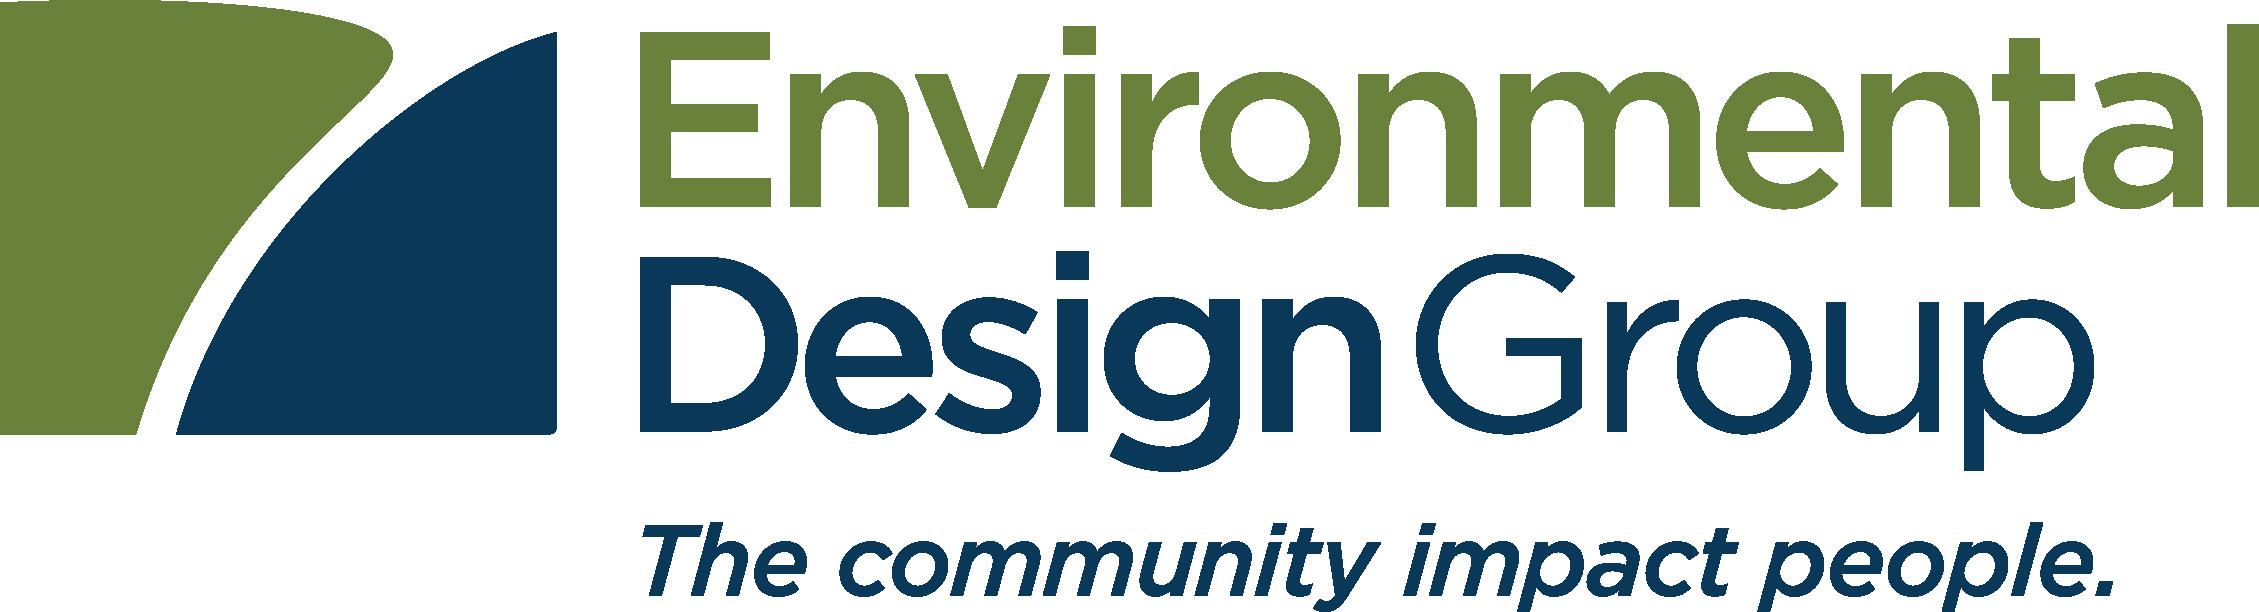 Enviormental Design Group.png